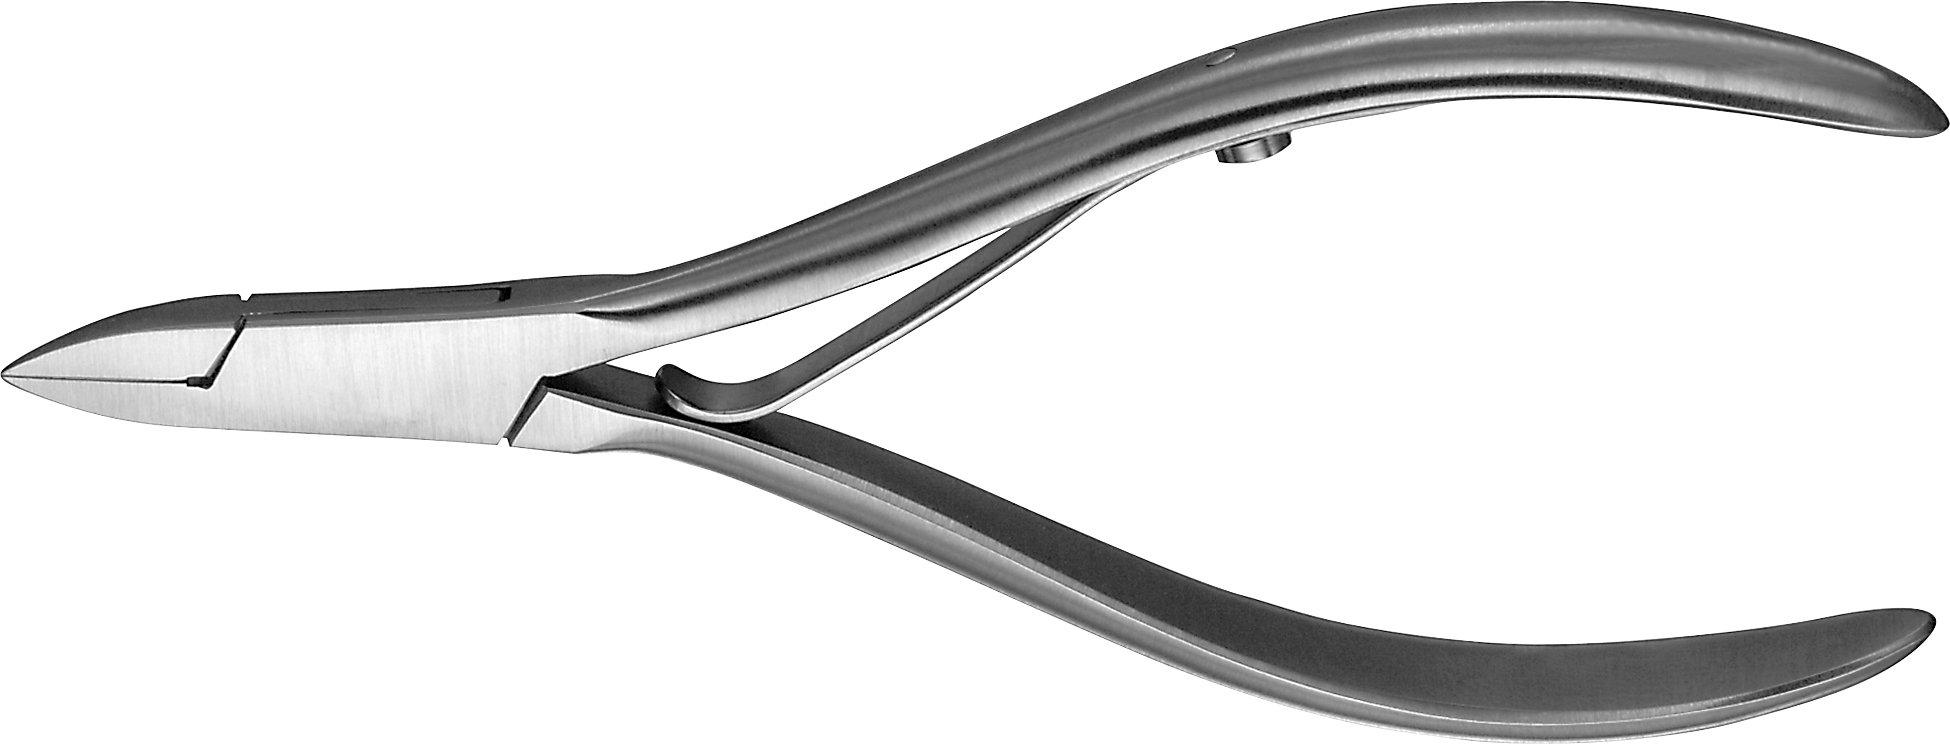 Aesculap HF470R Nail Corner Forceps 4-1/4, OR Grade